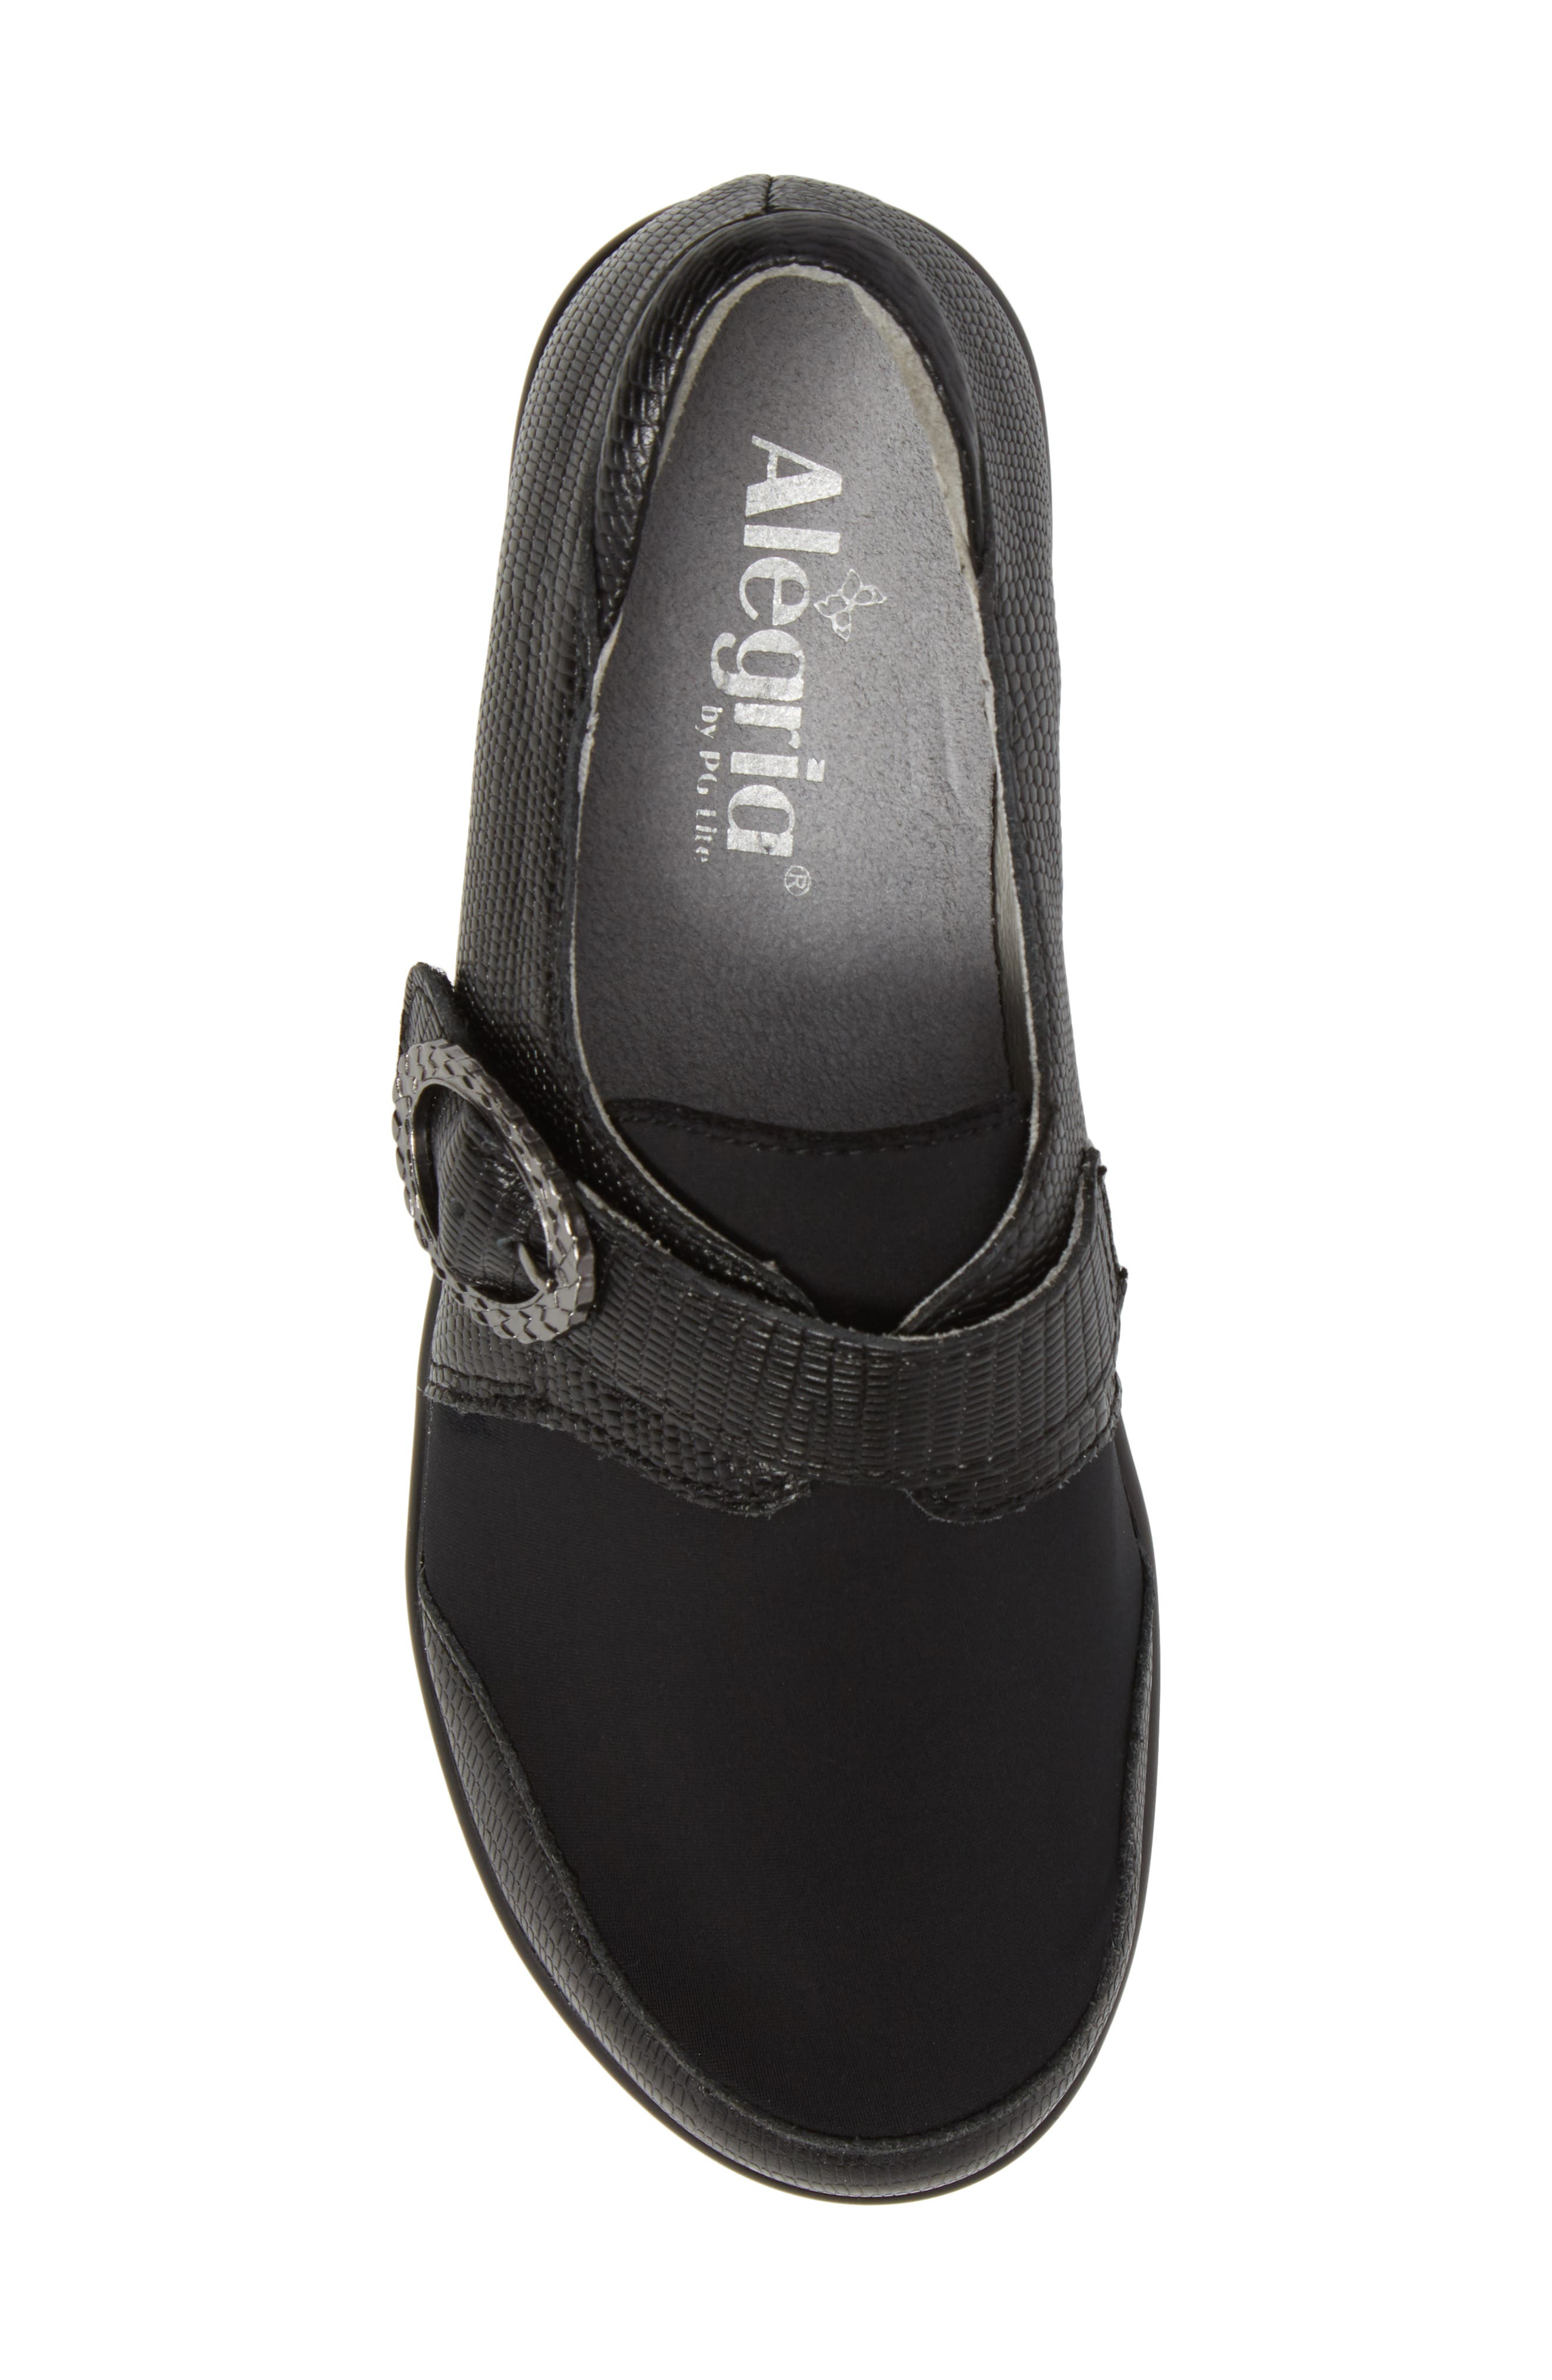 Holli Pump,                             Alternate thumbnail 5, color,                             Spiffy Black Leather